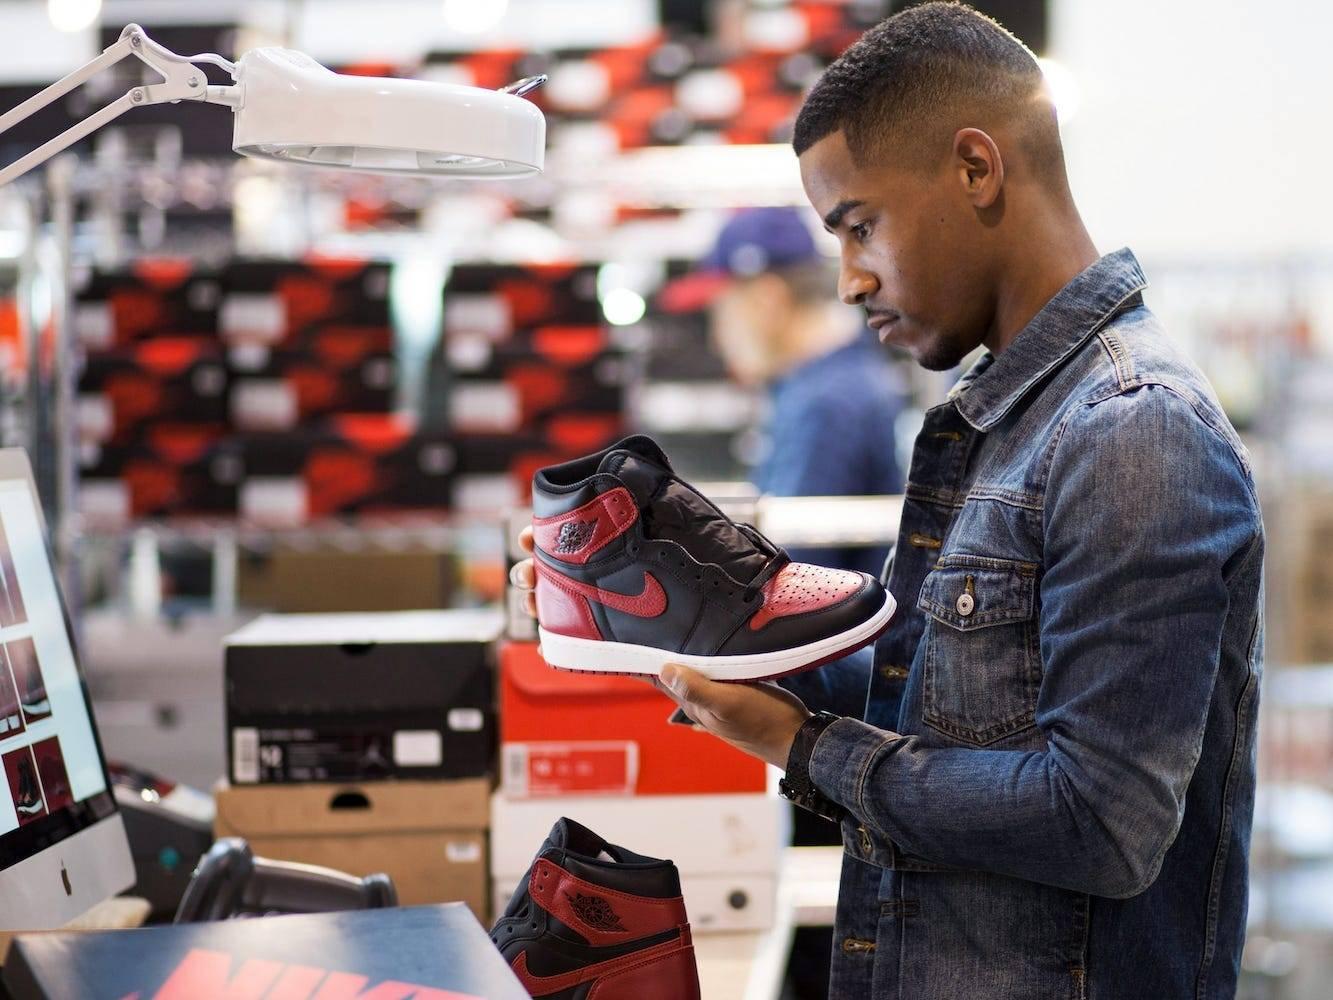 Sneaker resale platform GOAT raises